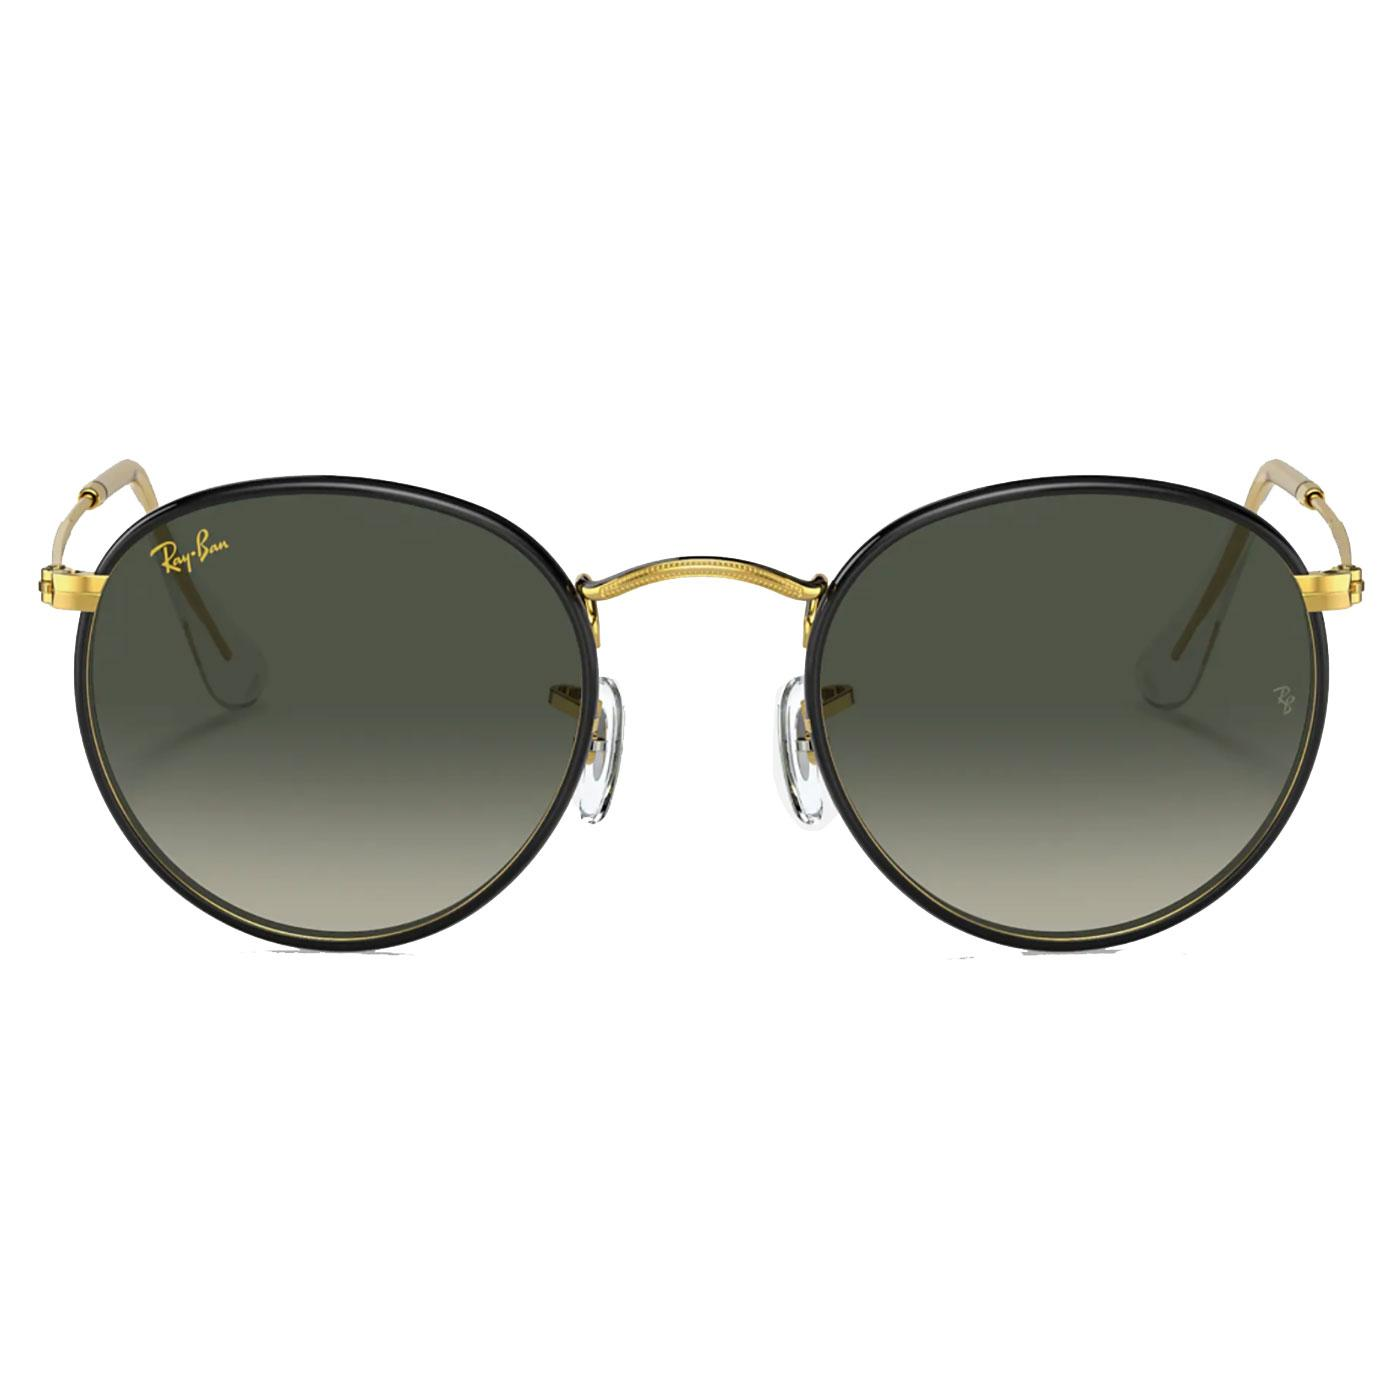 RAY-BAN Round Full Colour Retro 60s Sunglasses B